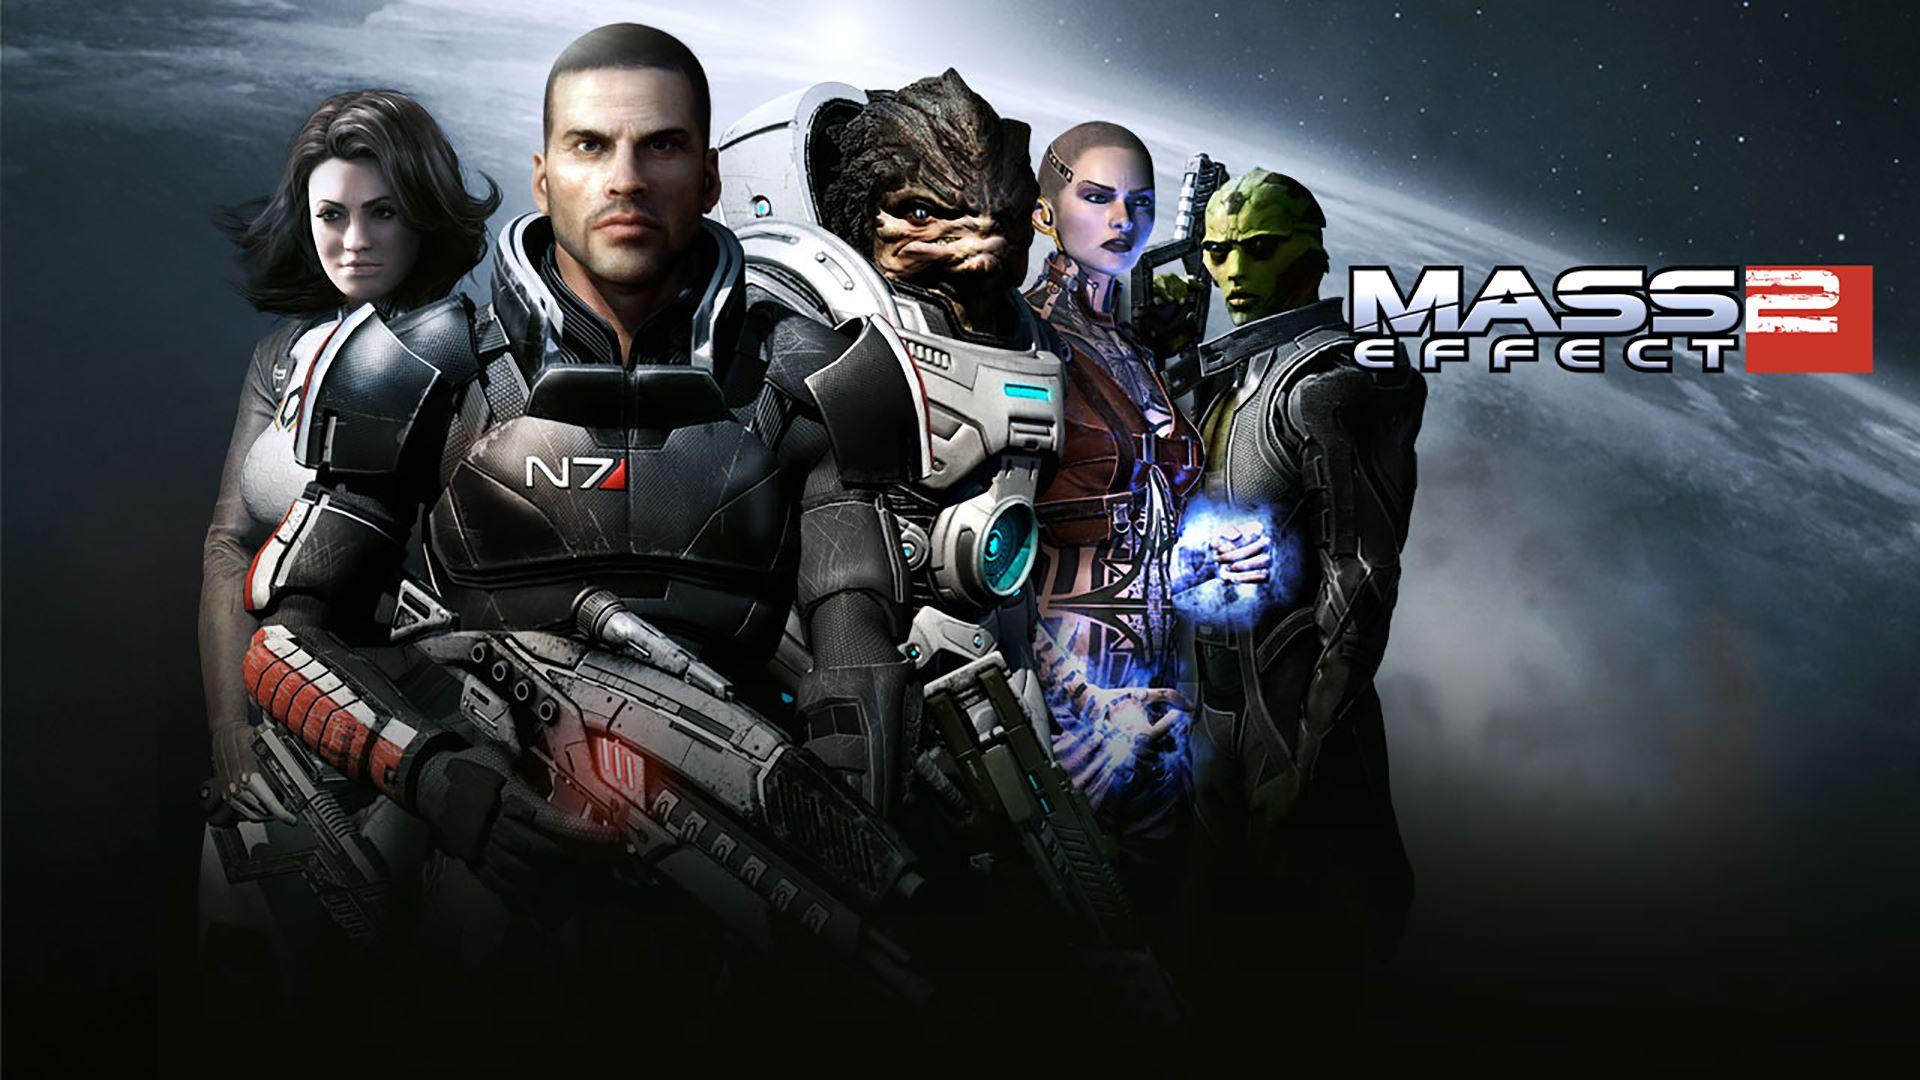 mass effect 2 genesis pc free download